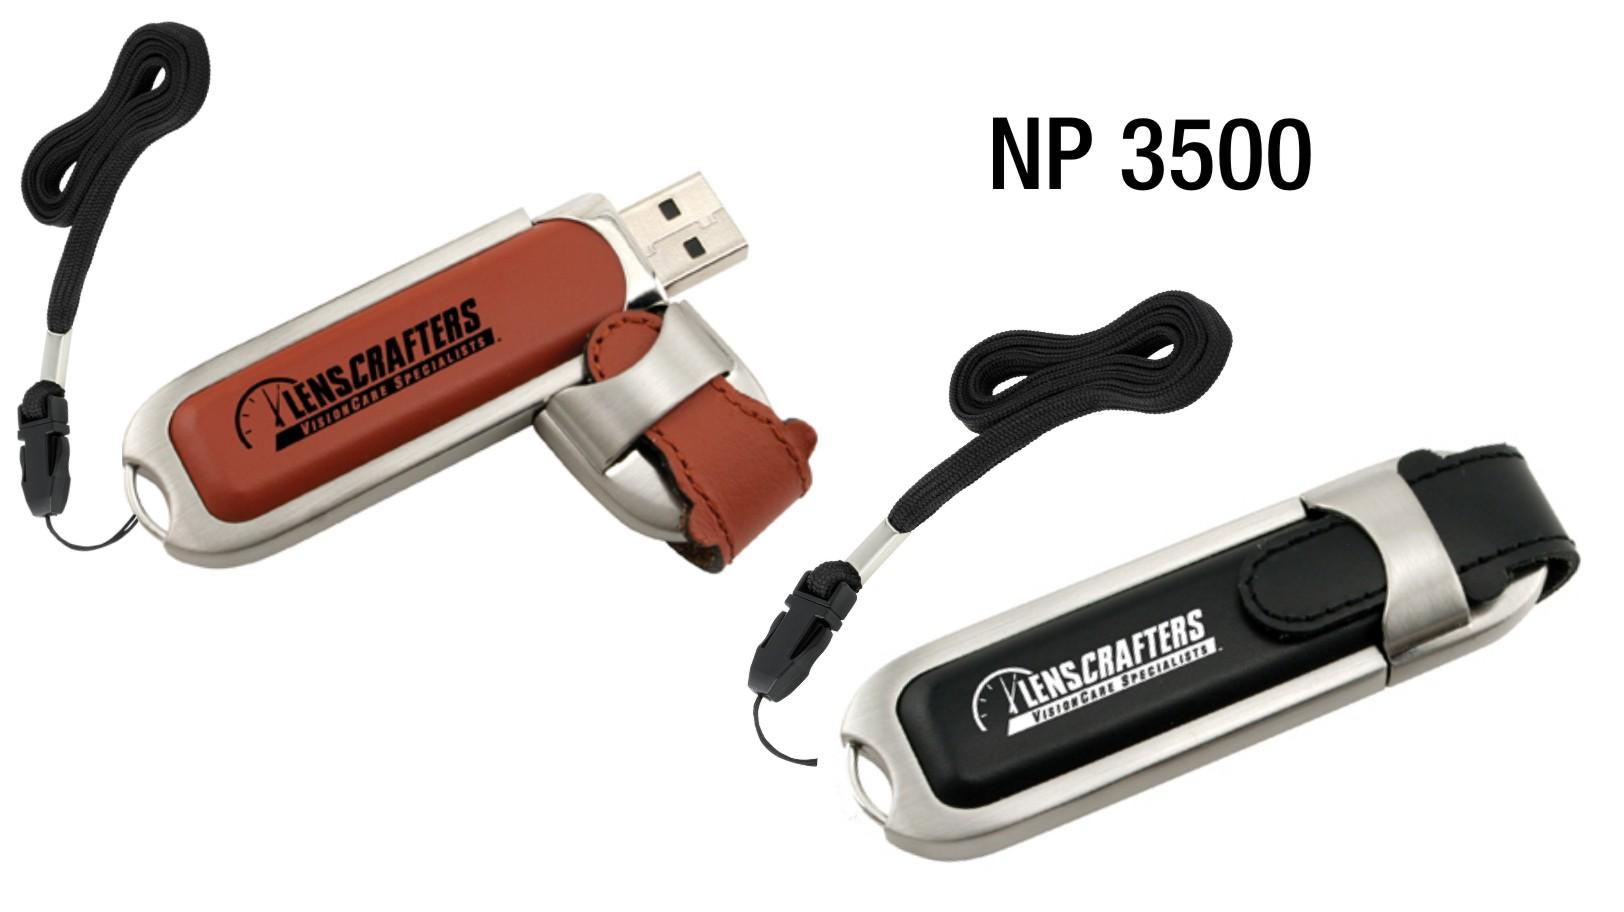 NP3500: Leather Flash Drive (8GB)